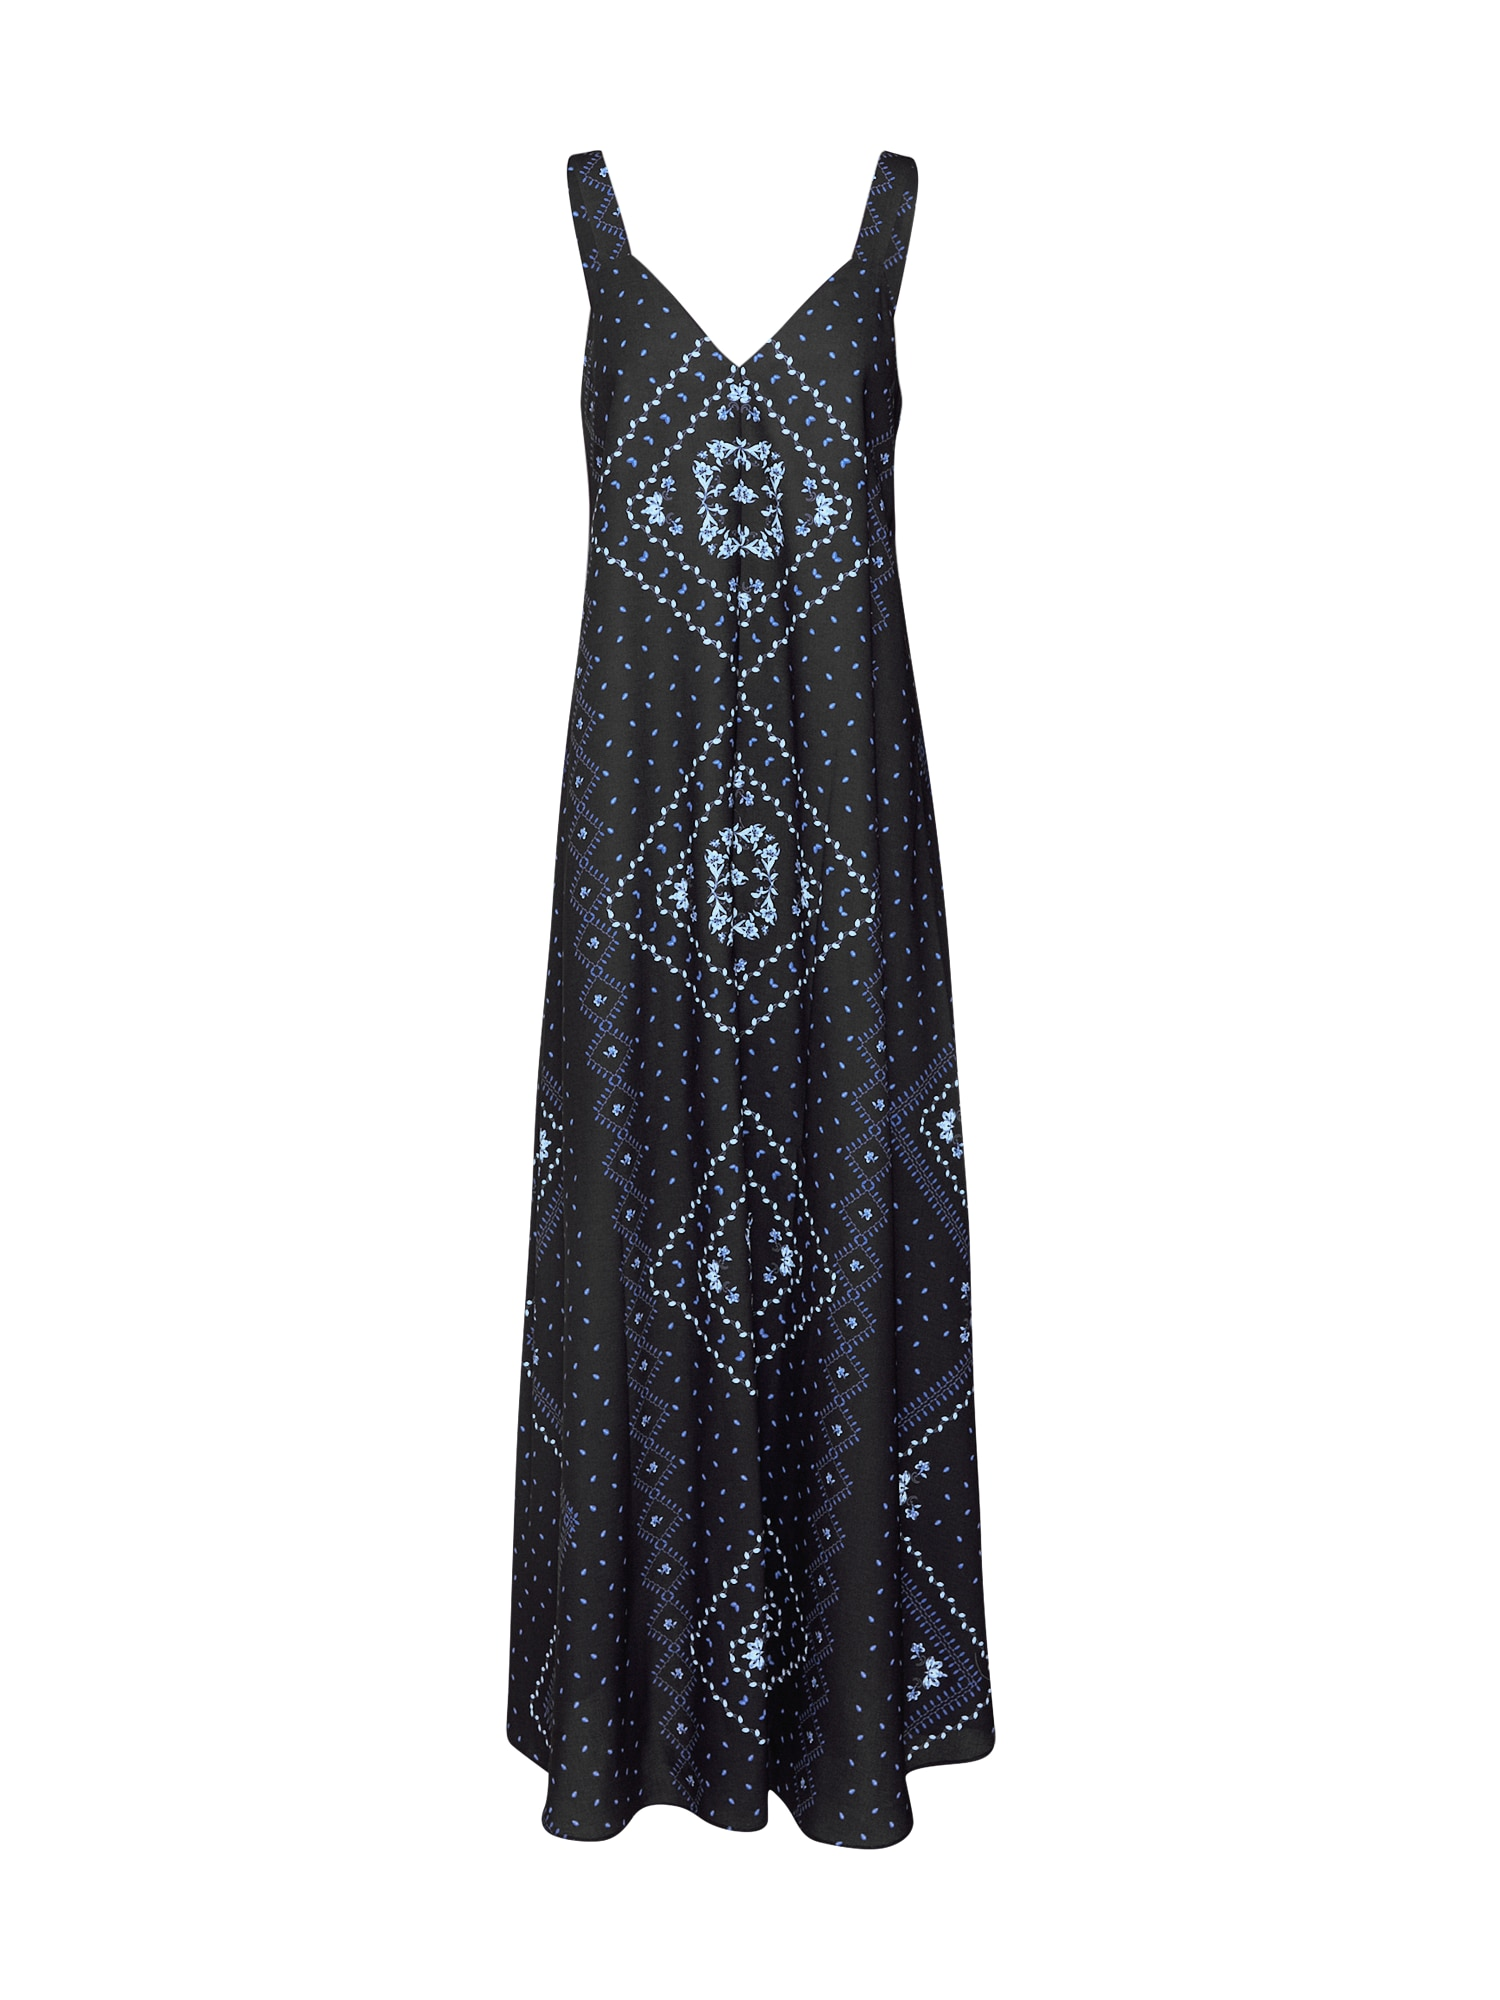 Šaty Annalie modrá černá bílá EDITED